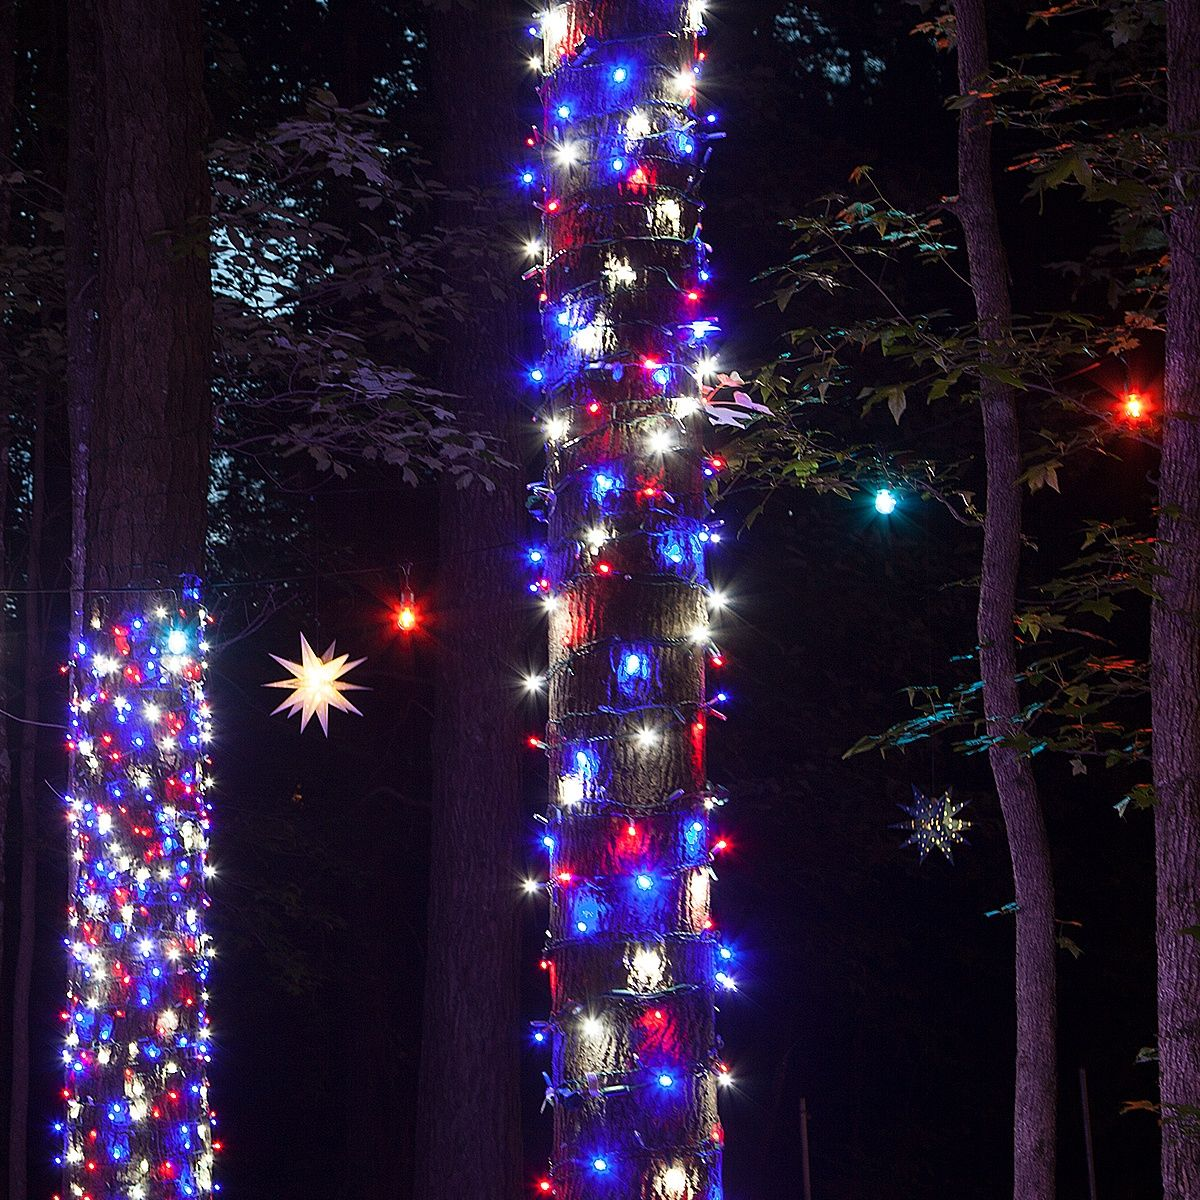 Wrapping Trees With Christmas Lights Christmas Lights Etc In 2020 Christmas Lights Outdoor Trees Blue Christmas Lights Christmas Lights